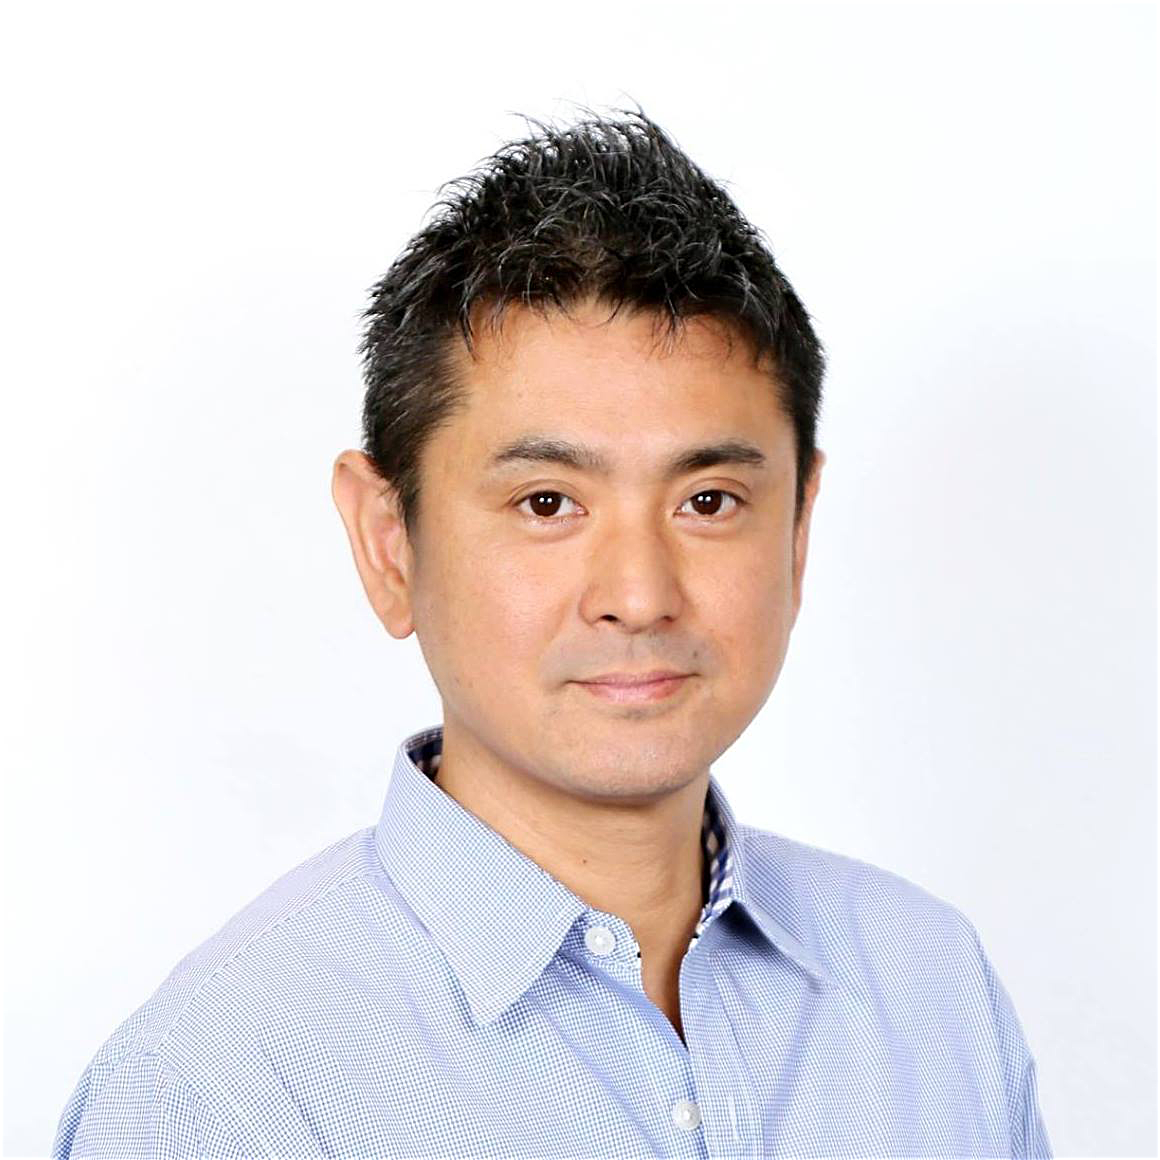 Kaniro Sato